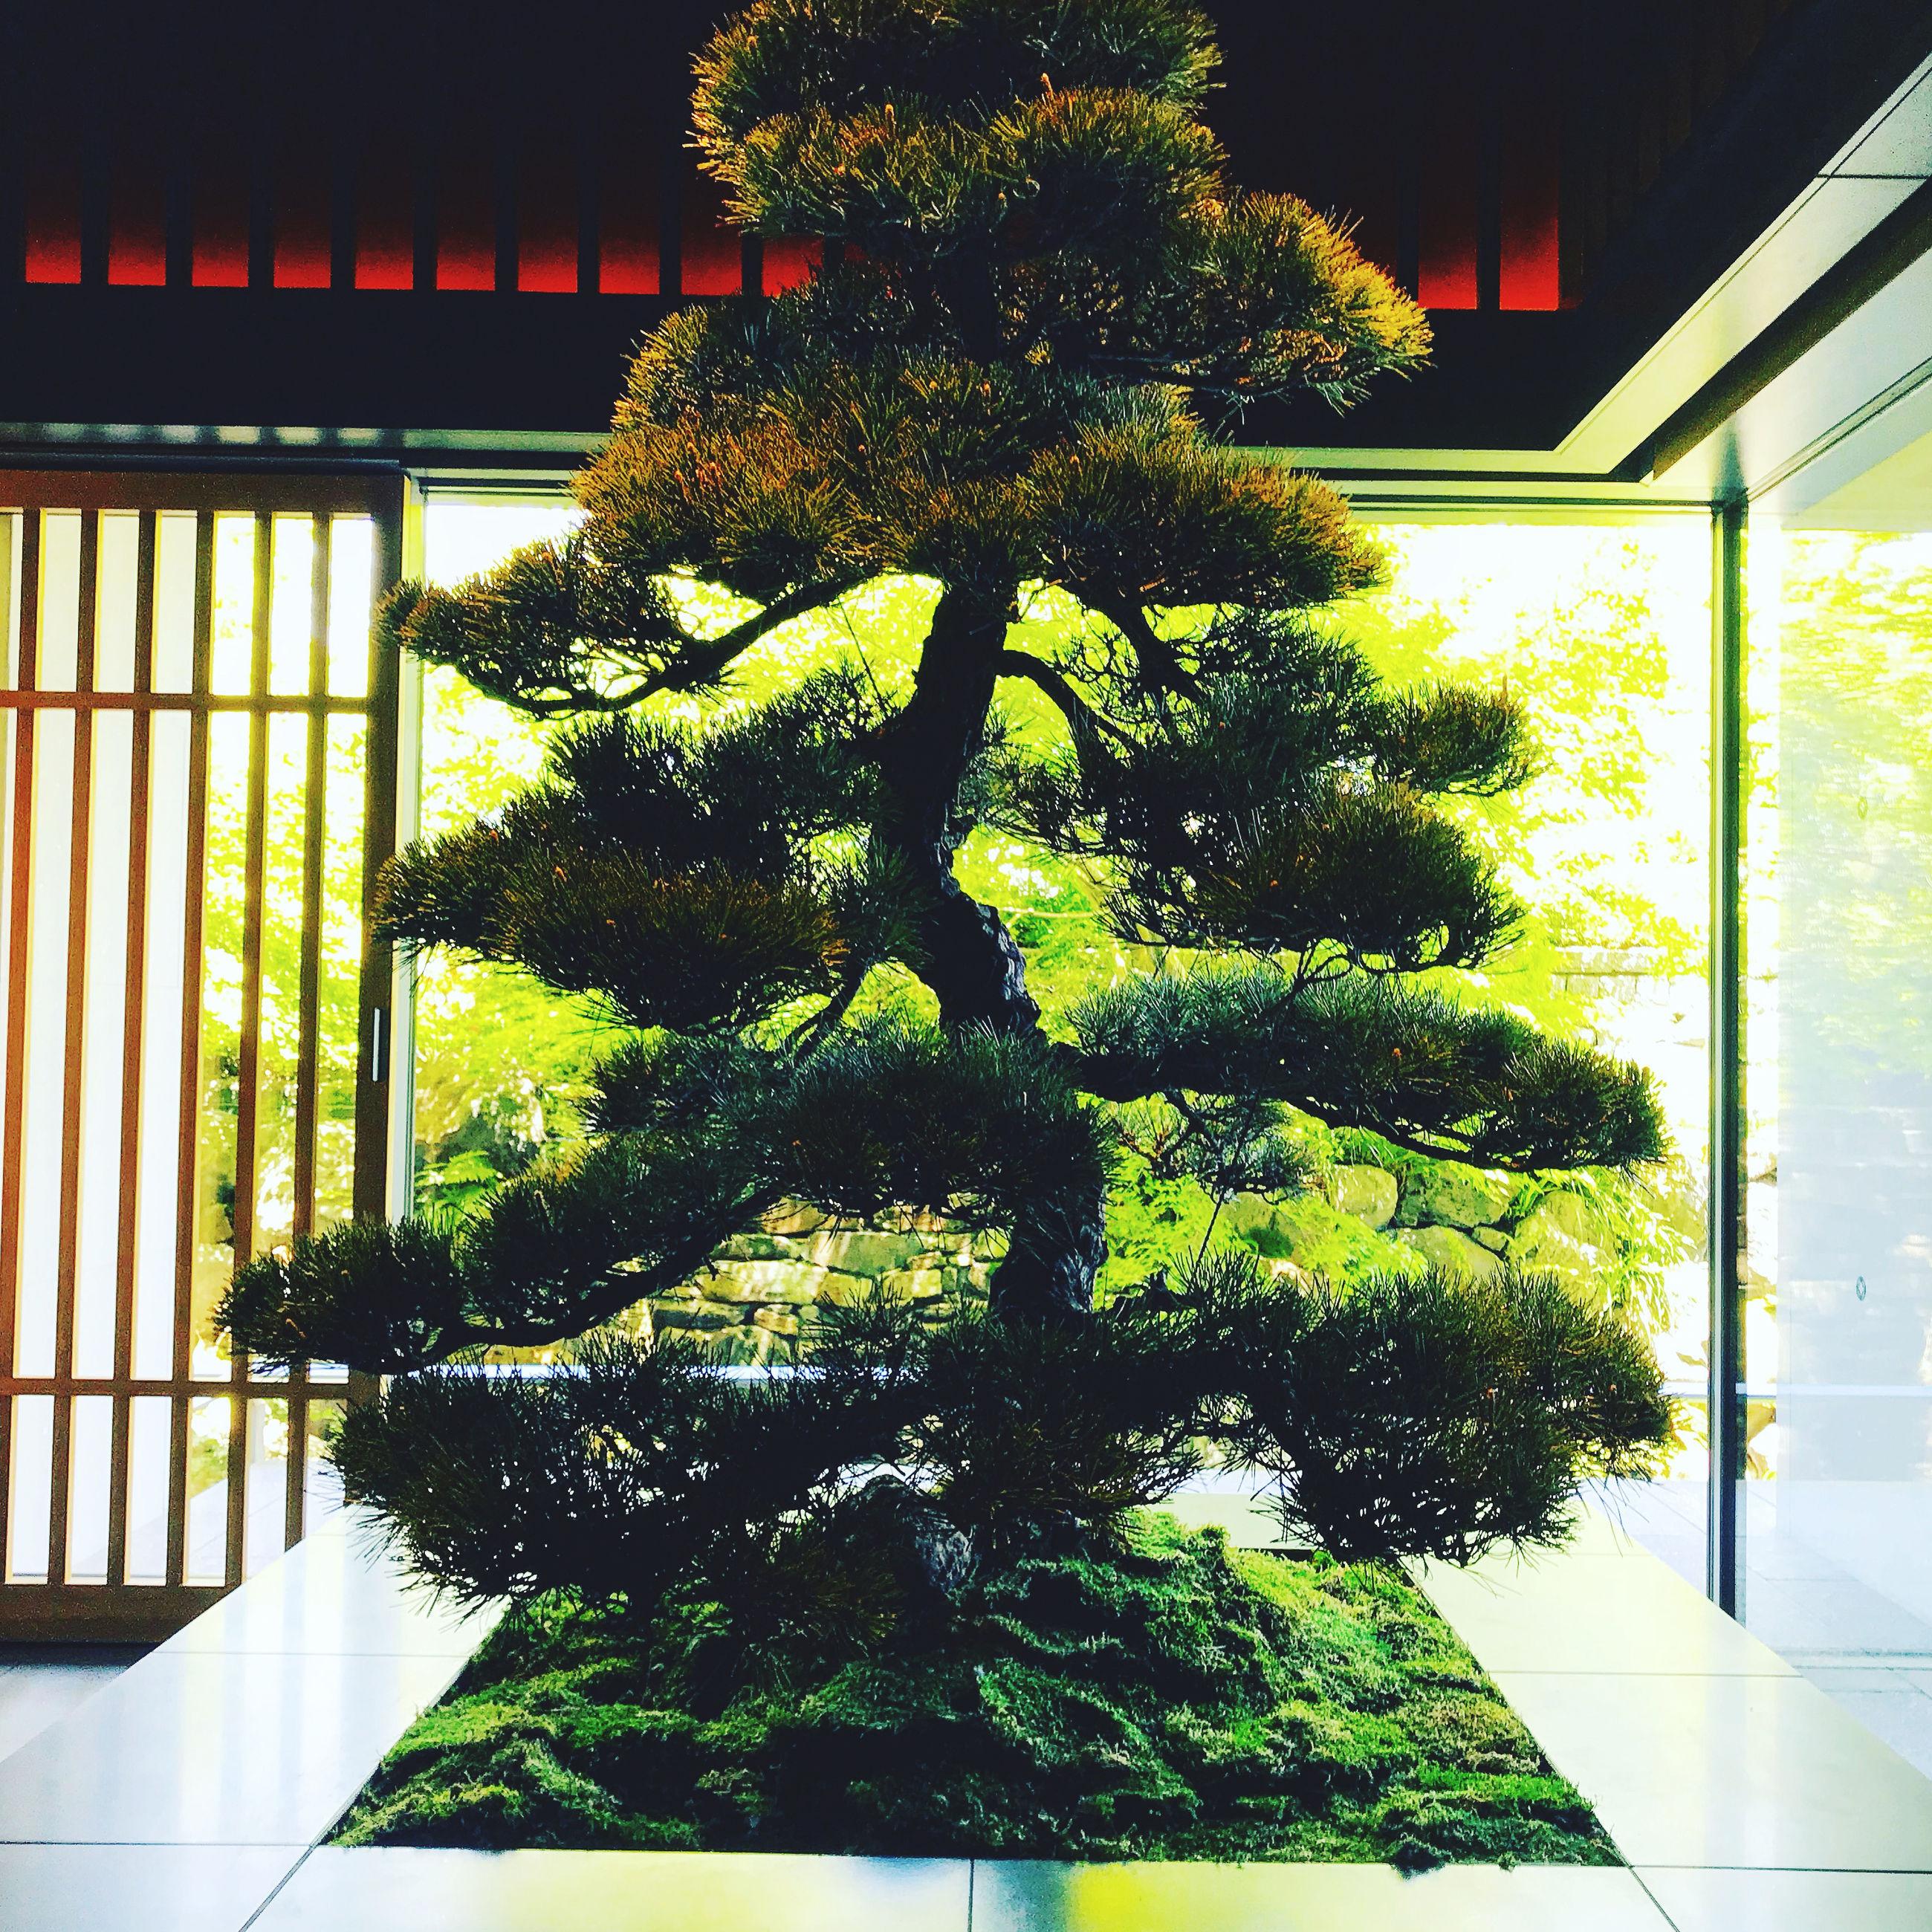 TREE BY HOUSE WINDOW